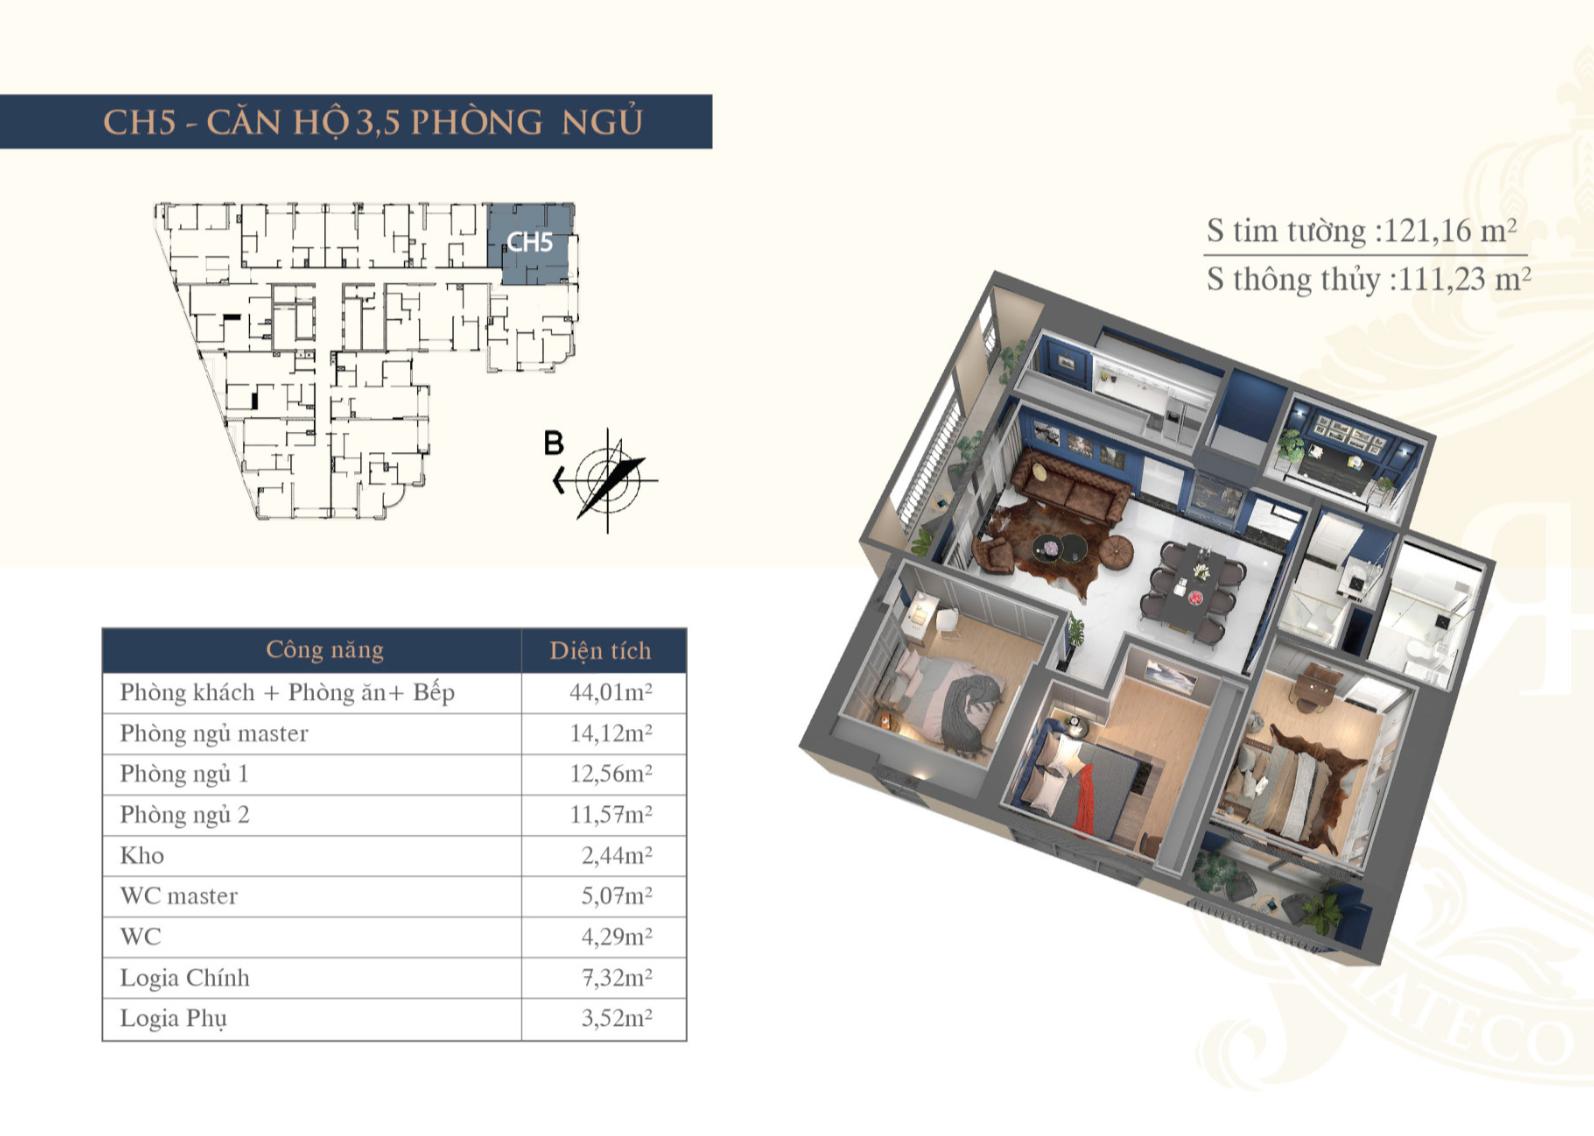 Chi tiết căn hộ Hateco Plaza - CH5